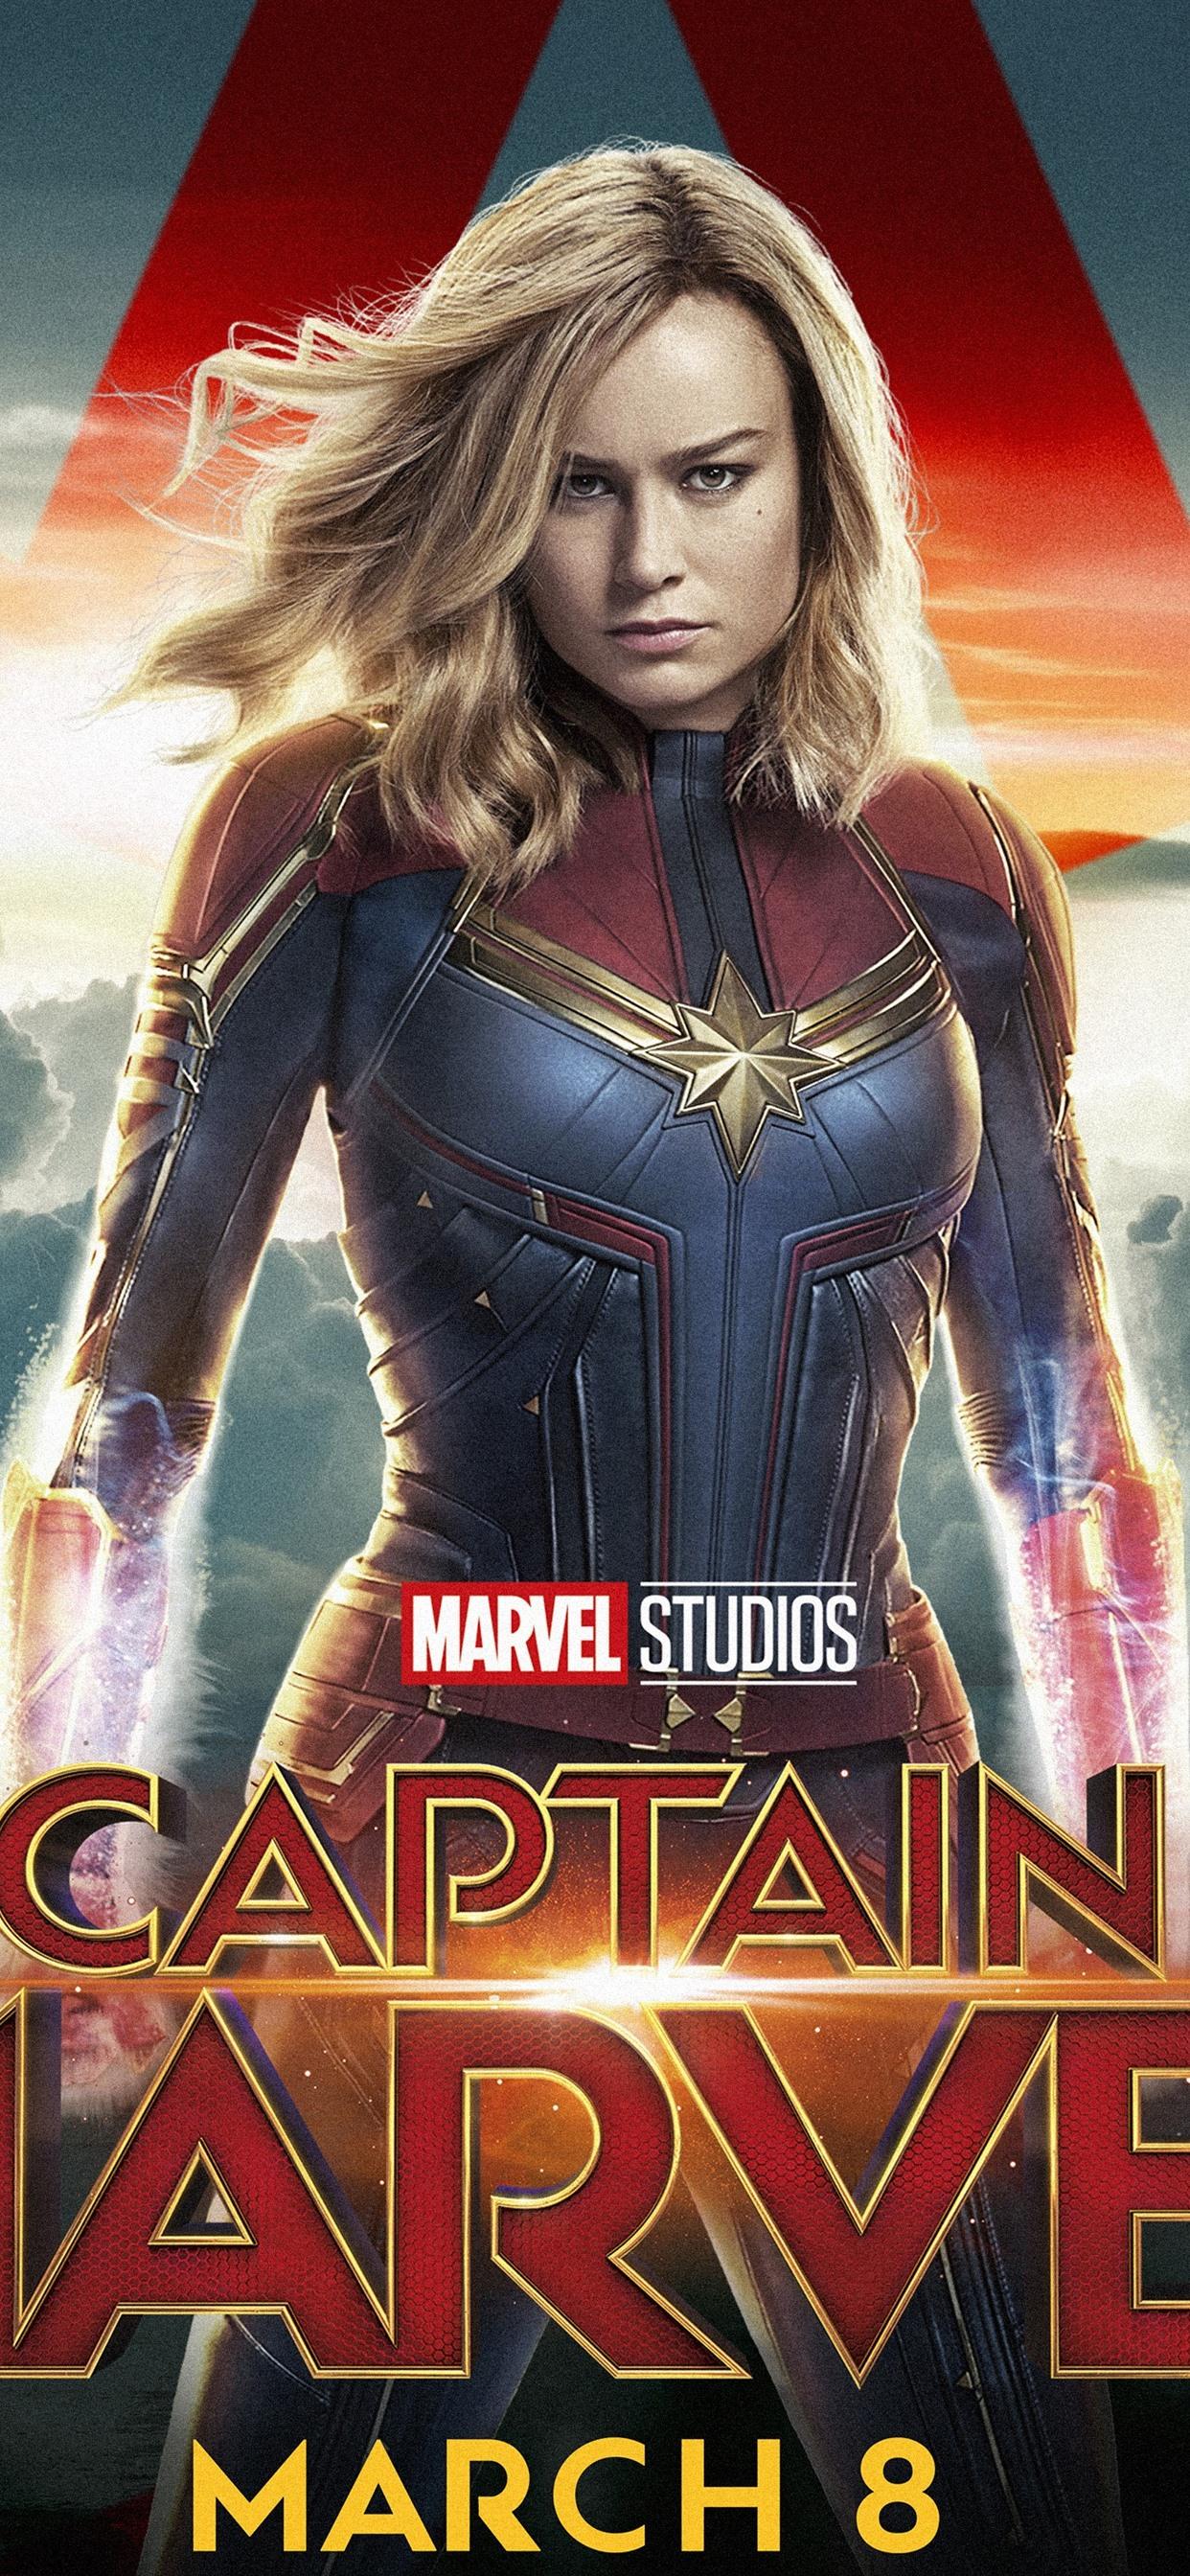 Captain Marvel Brie Larson 1242x2688 Iphone Xs Max Wallpaper